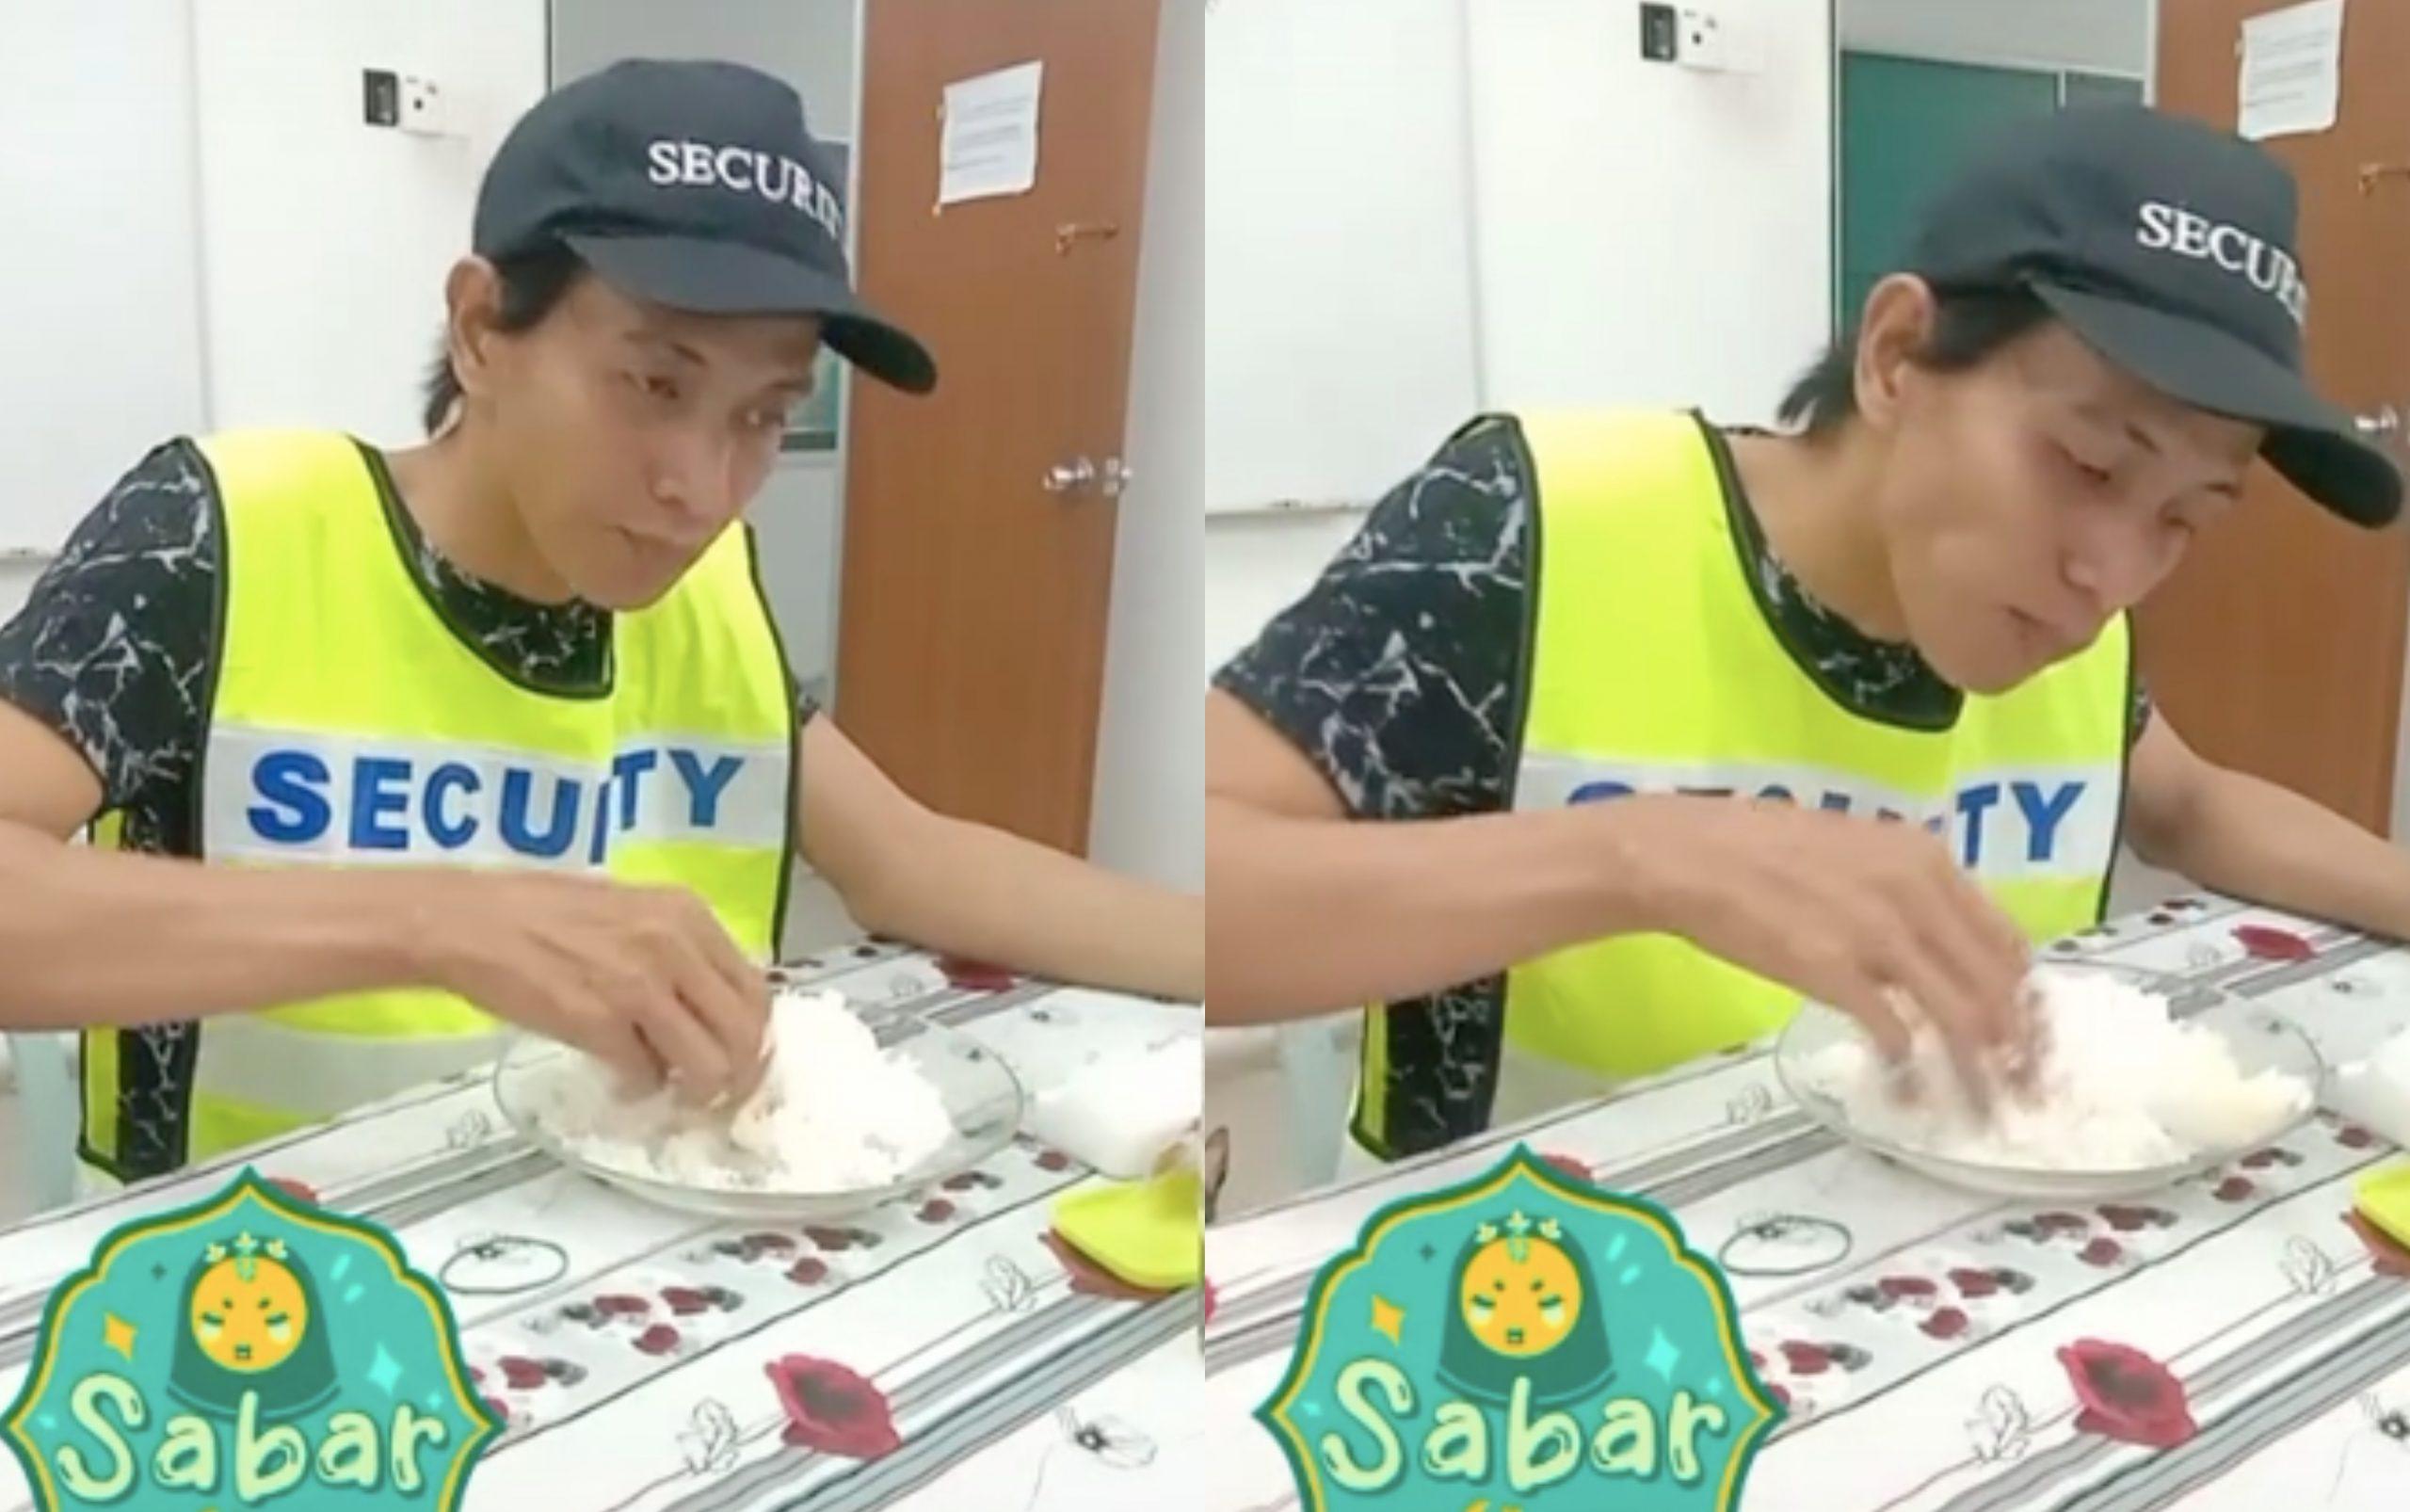 Makan Nasi 'Lauk' Garam, Netizen Tersentuh Lihat Menu Pengawal Keselamatan Ini 3